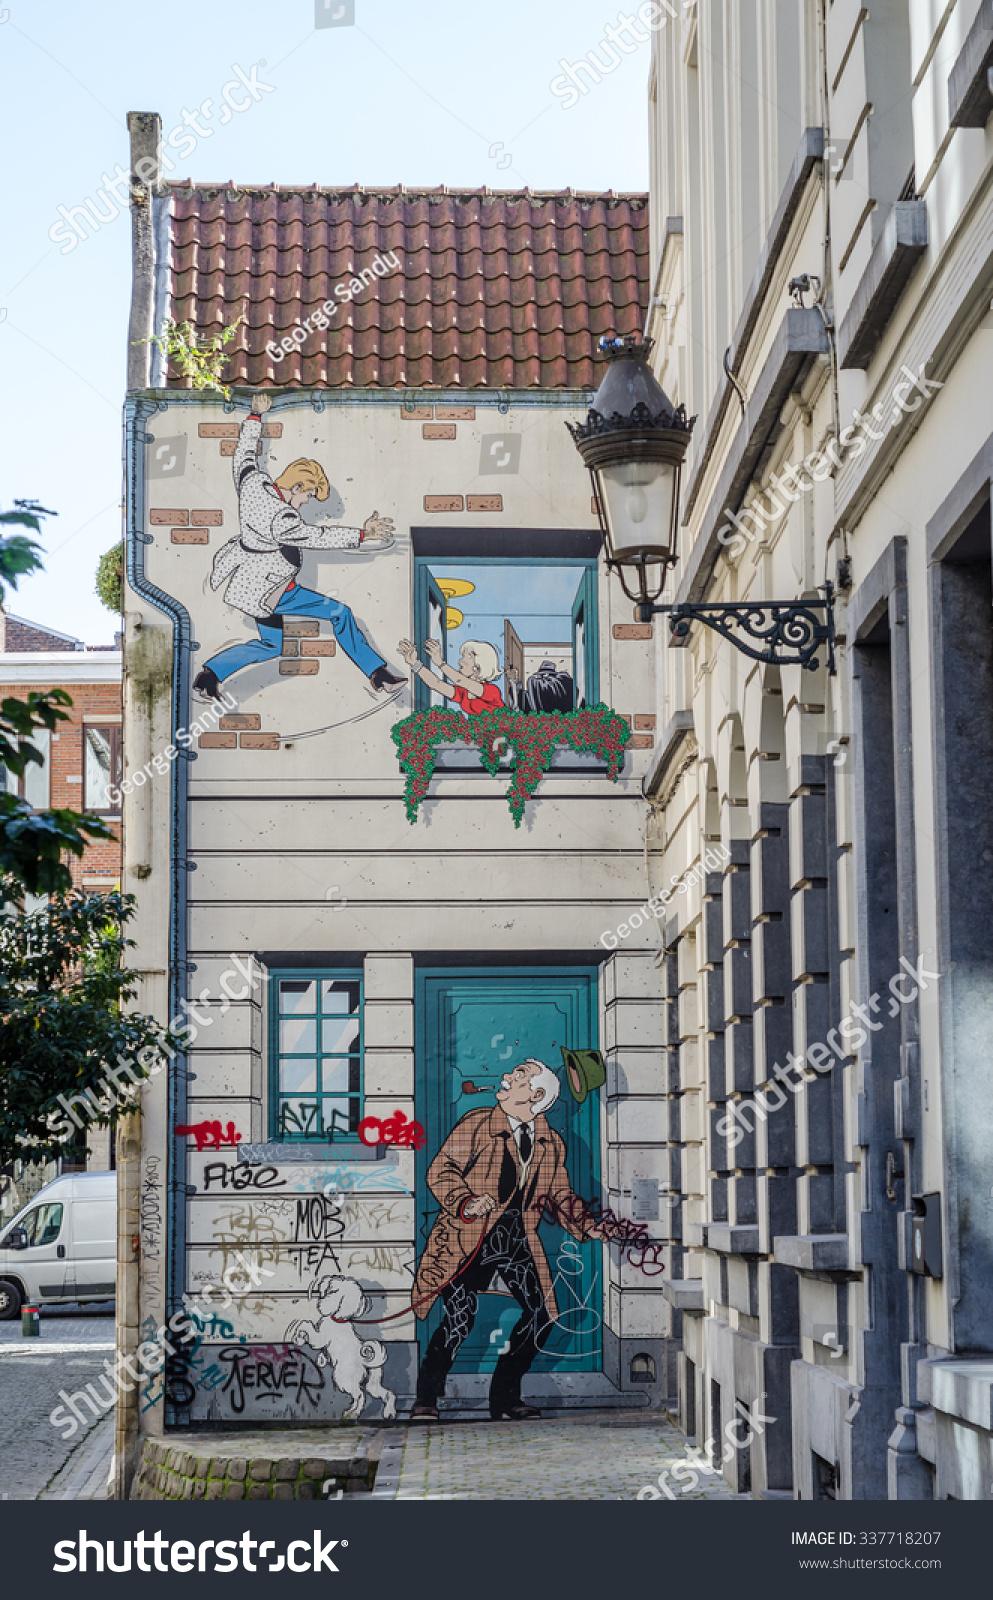 03 October 2015 Brussels Urban Graffiti Stock Photo Edit Now